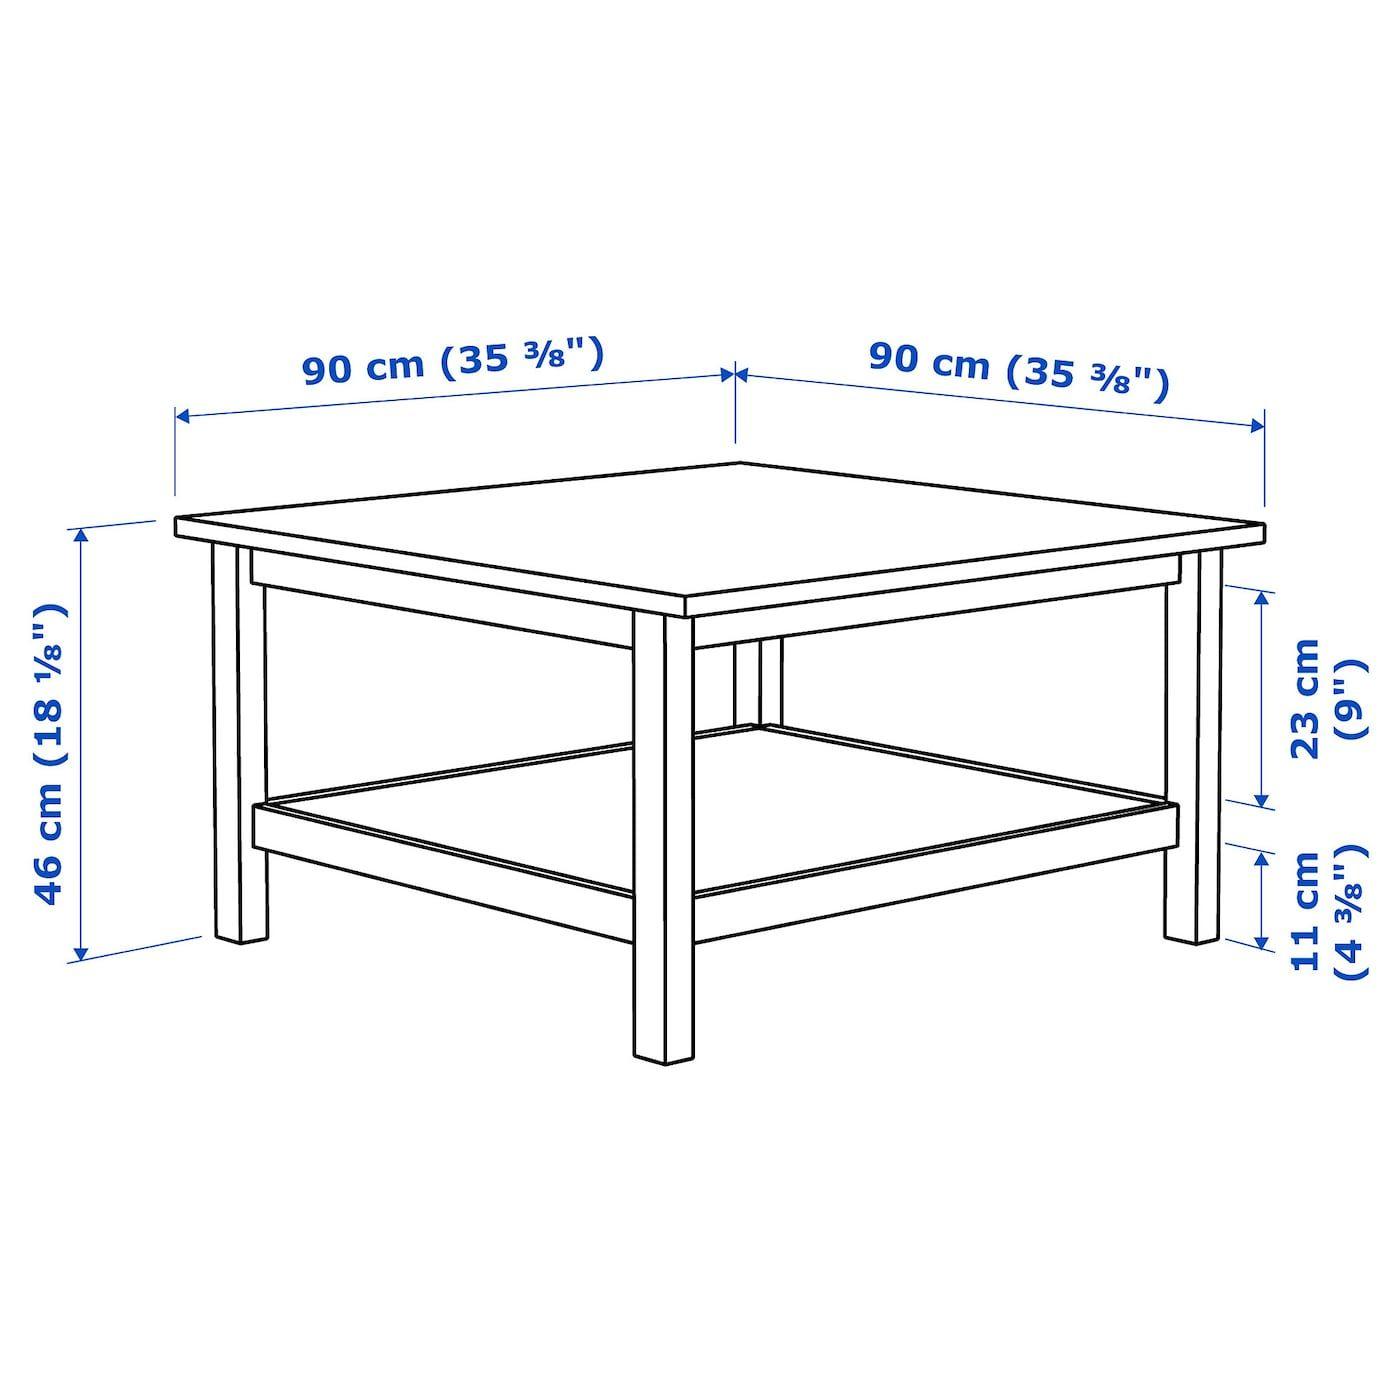 Hemnes Coffee Table Black Brown 353 8x353 8 90x90 Cm Ikea Ikea Hemnes Coffee Table Coffee Table White Hemnes [ 1400 x 1400 Pixel ]